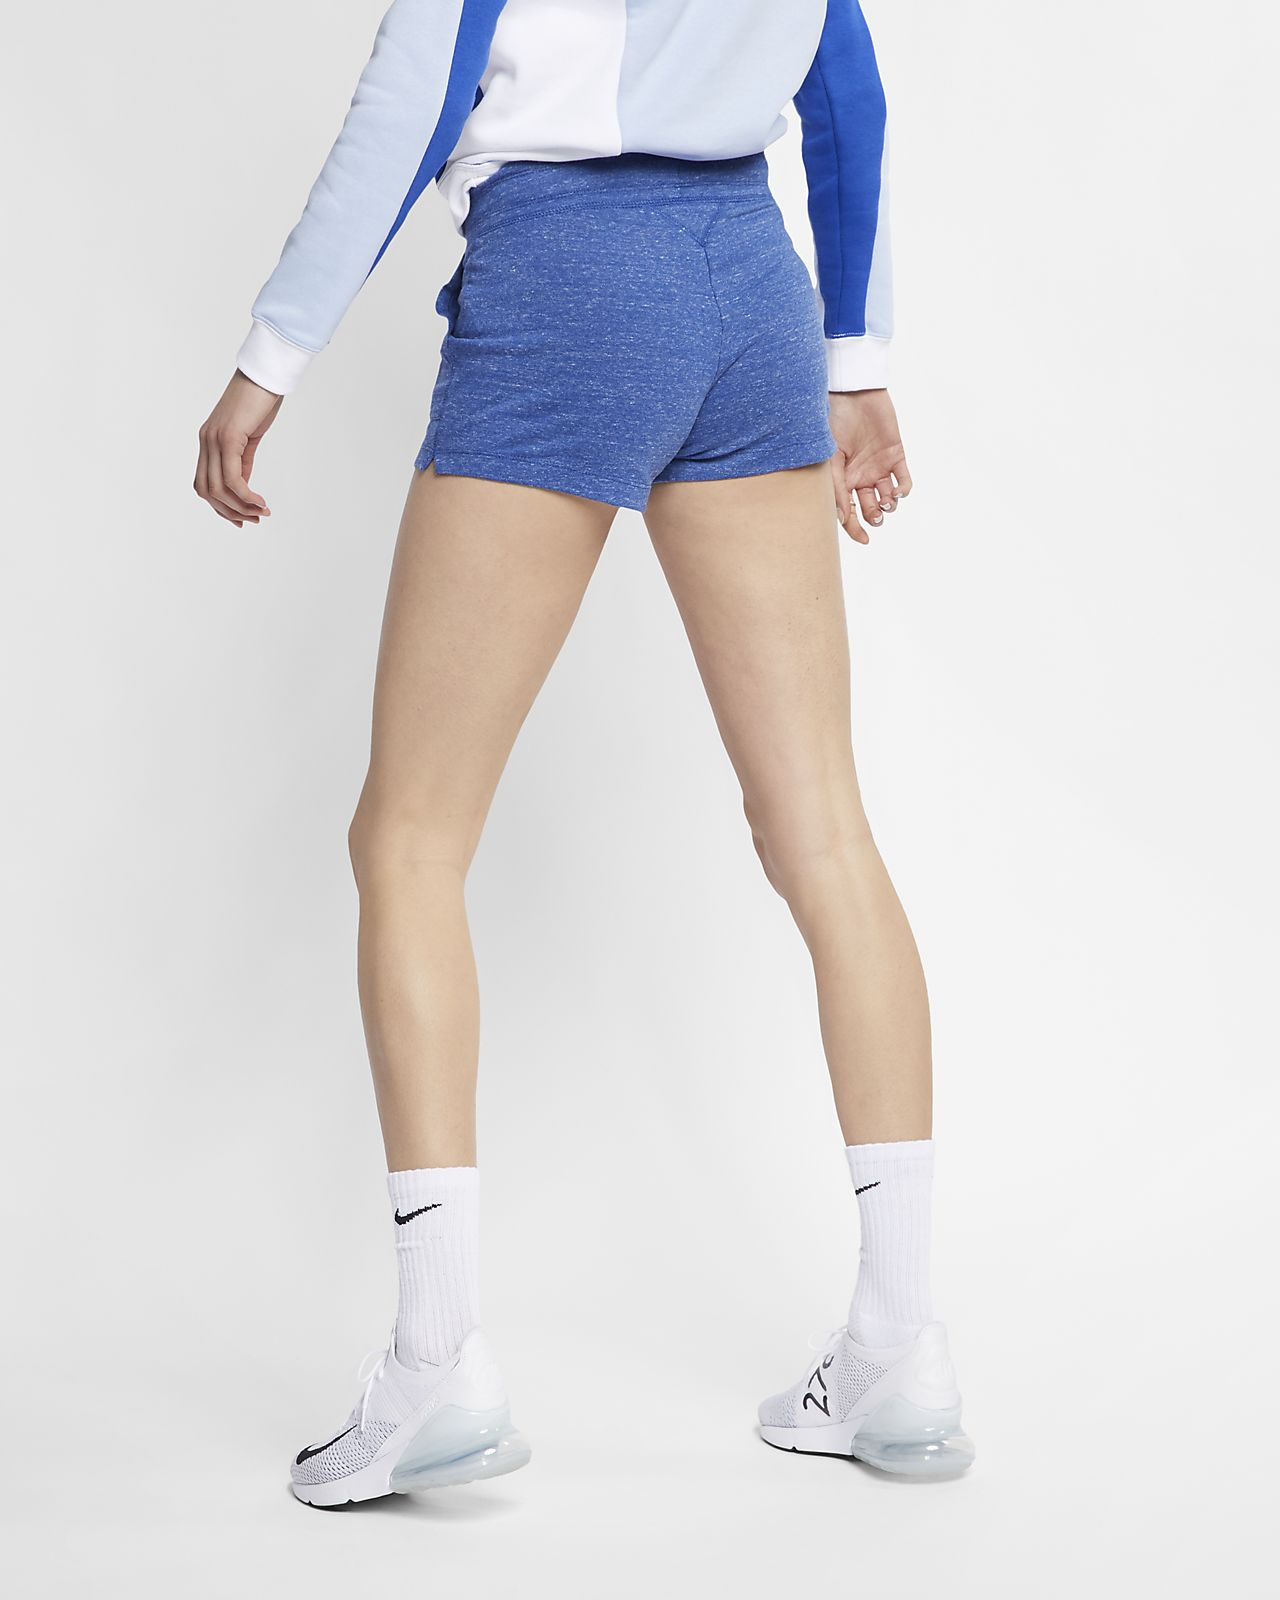 d11fae0f27ab Nike Sportswear Gym Vintage Women s Shorts. Nike.com